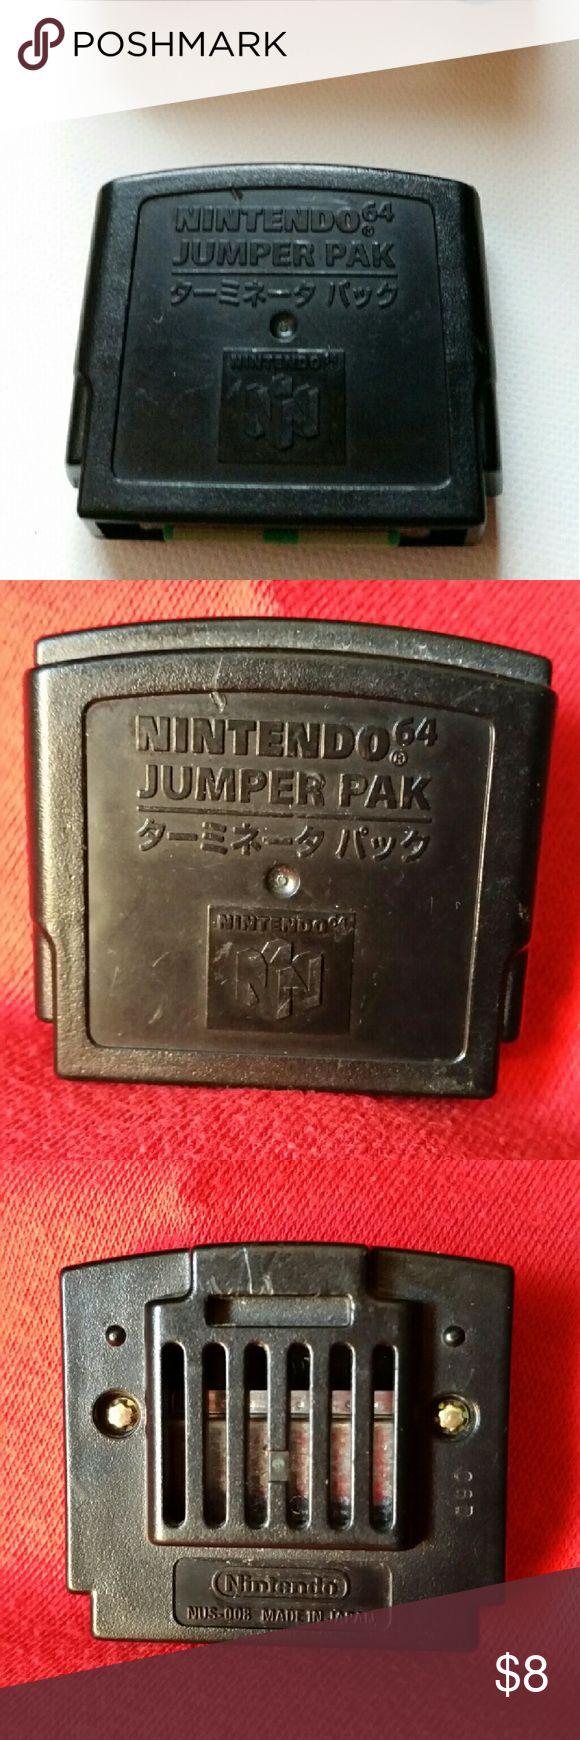 Nintendo 64: Jumper Pak Used condition. Nintendo Other